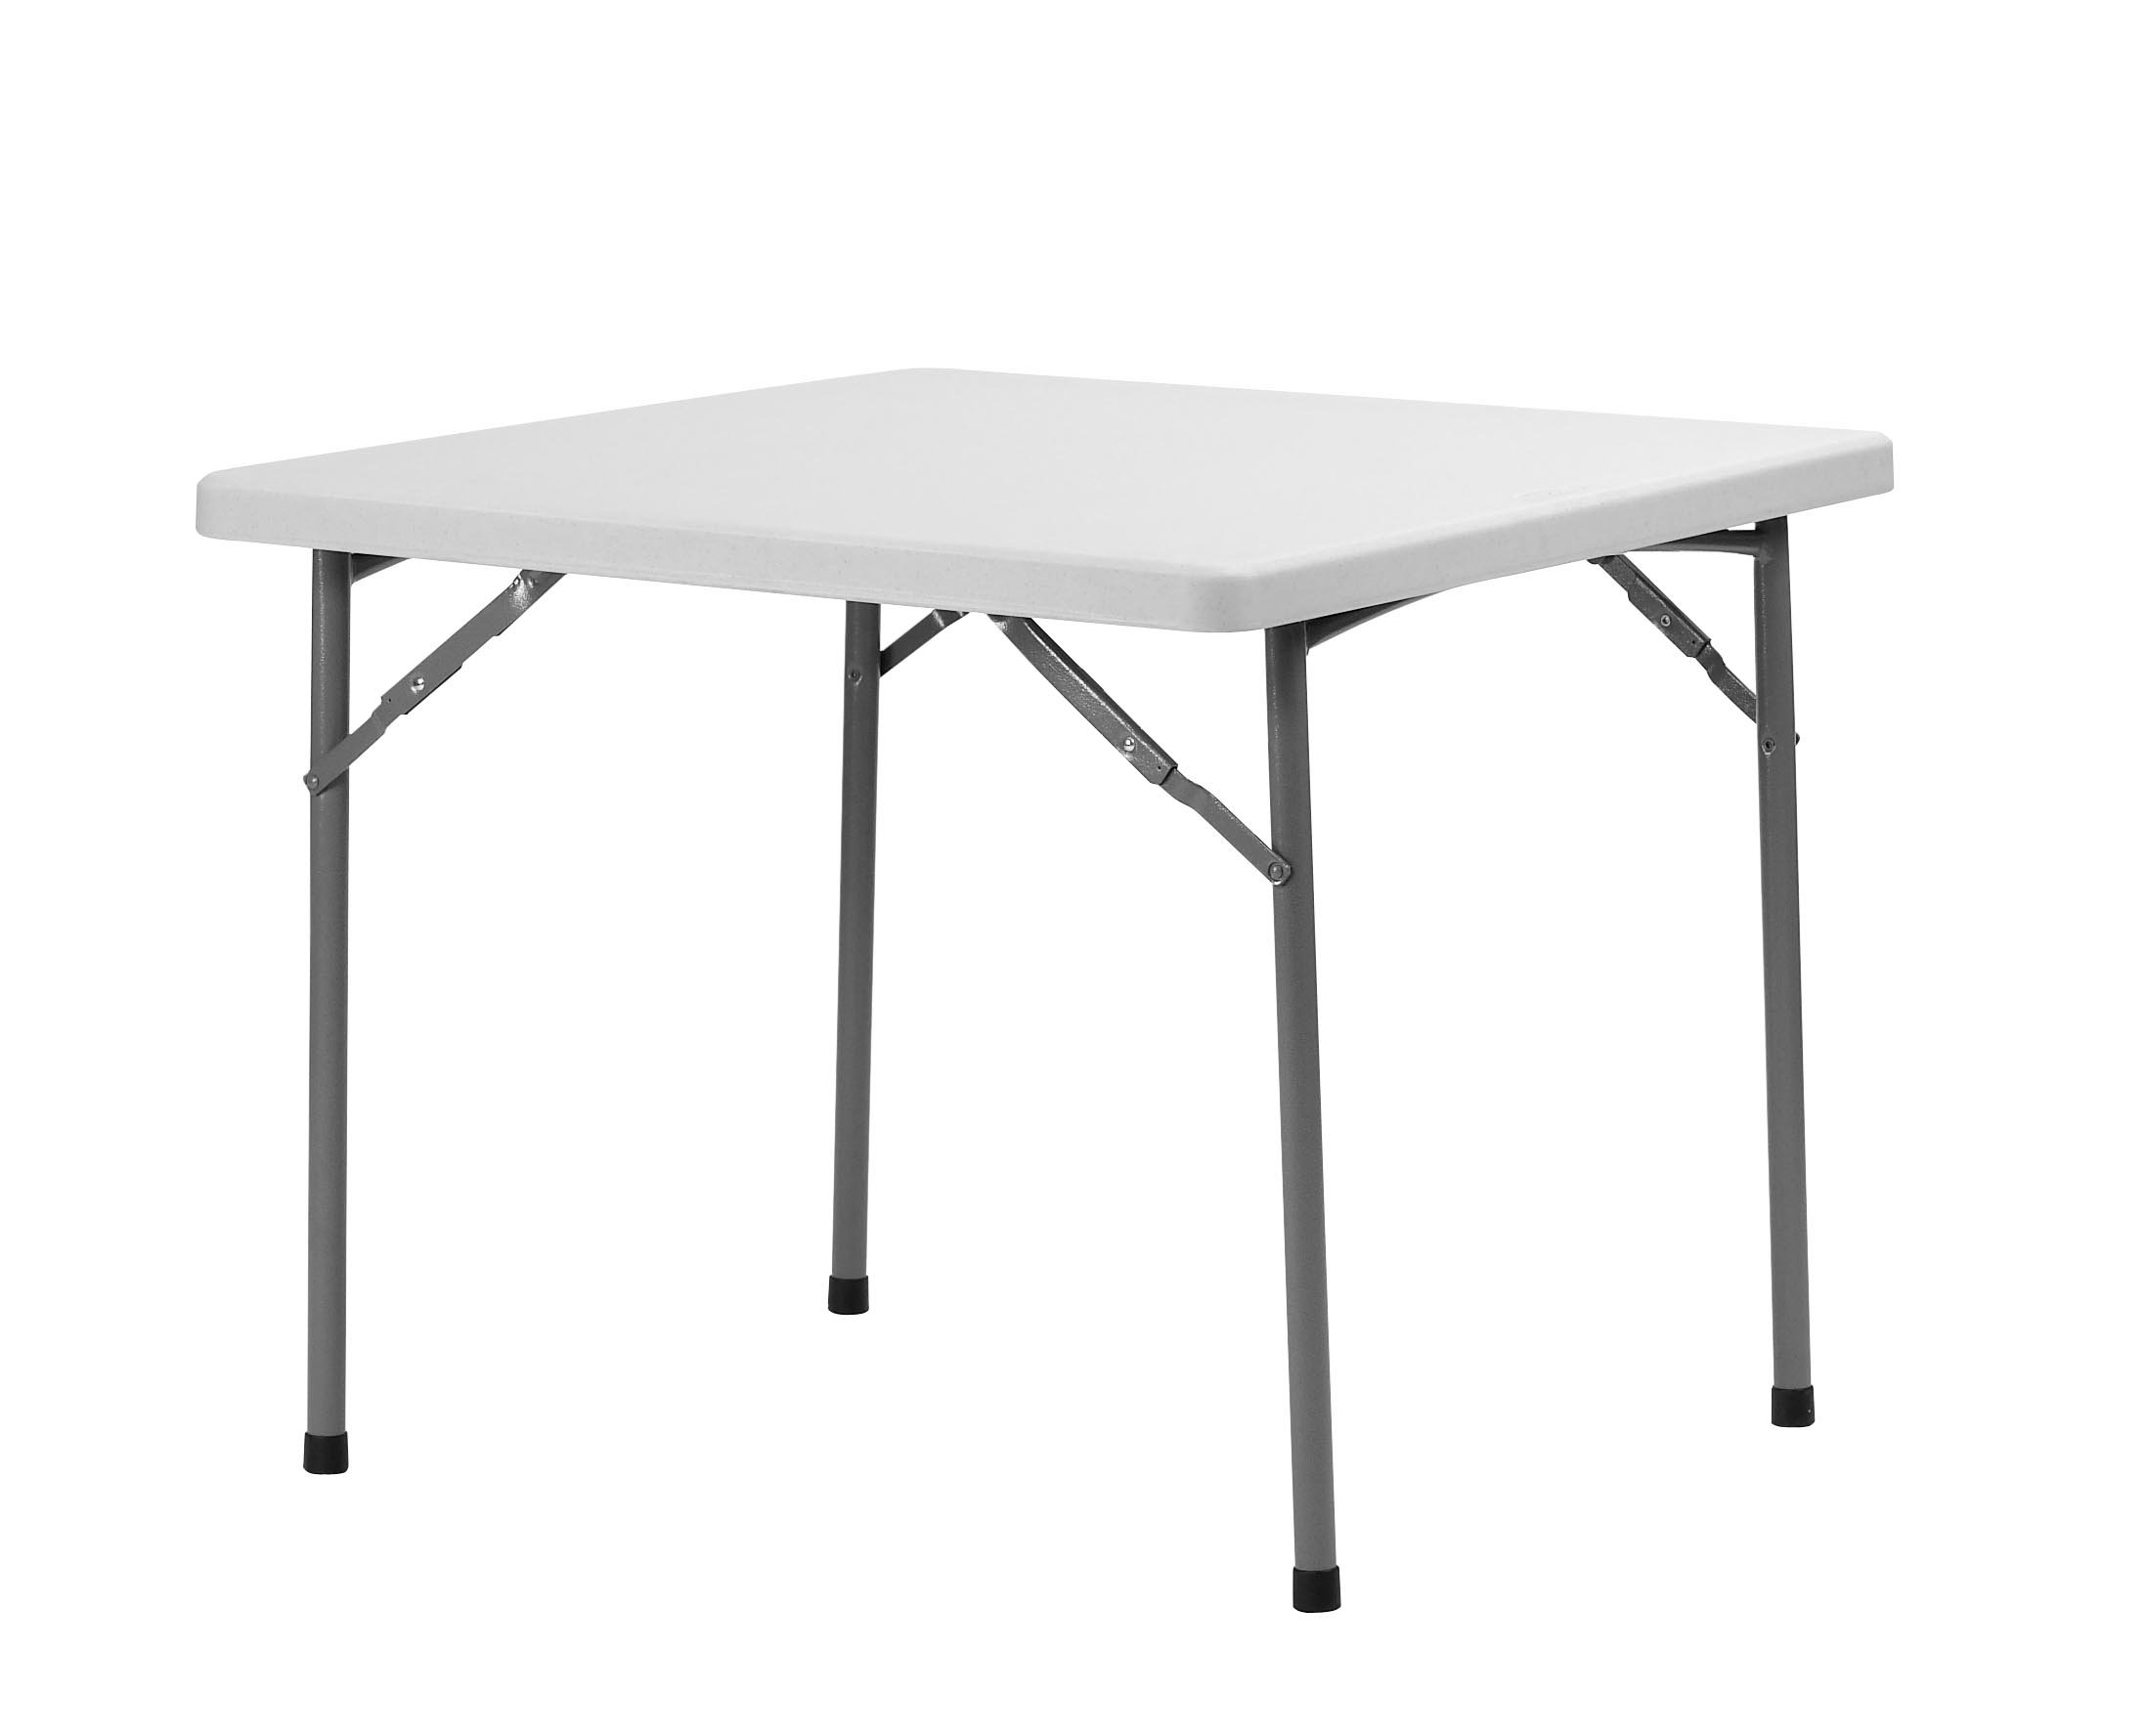 Maxchief XXL90 - Mesa plegable, 91.4 x 91.4 x 74.3 cm, color gris claro: Amazon.es: Jardín